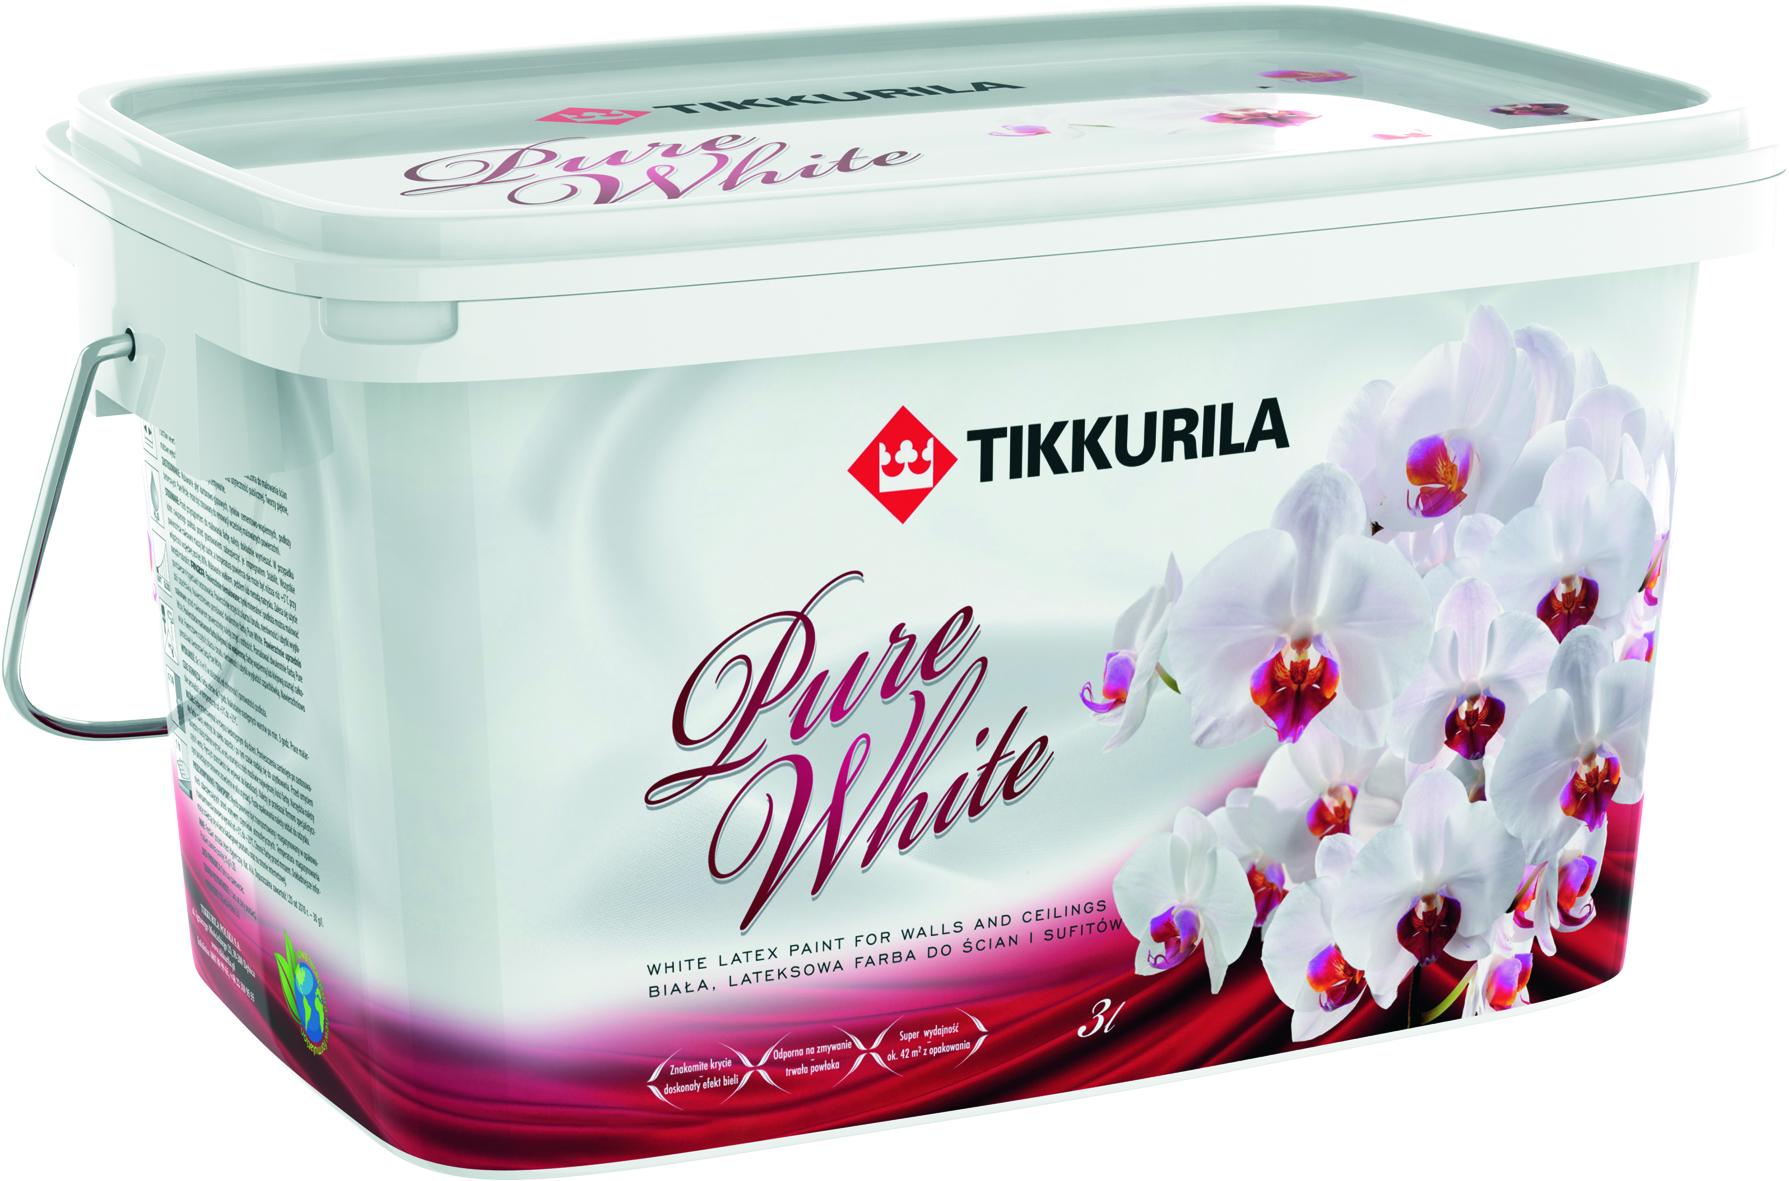 Tikkurila Pure White